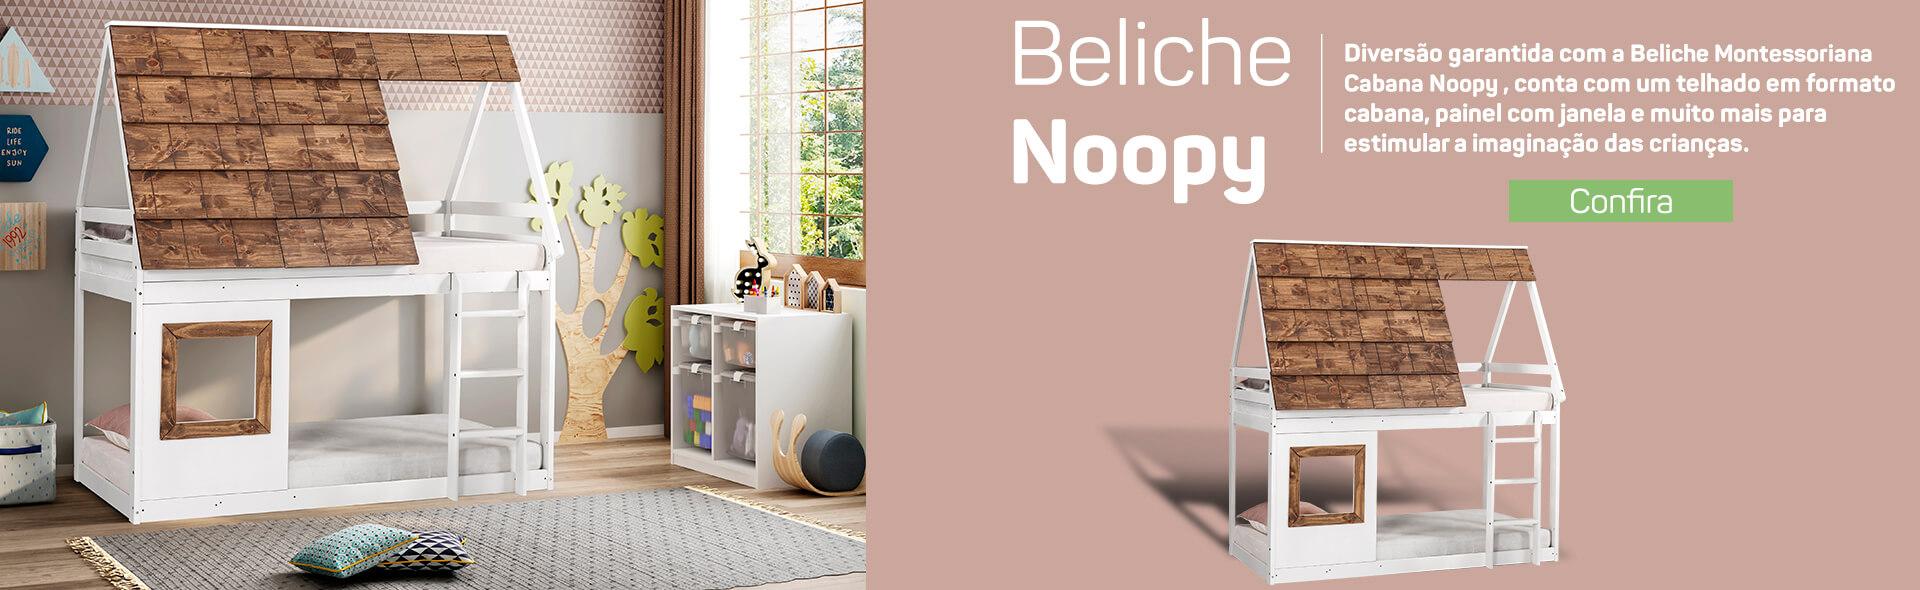 Beliche Noopy